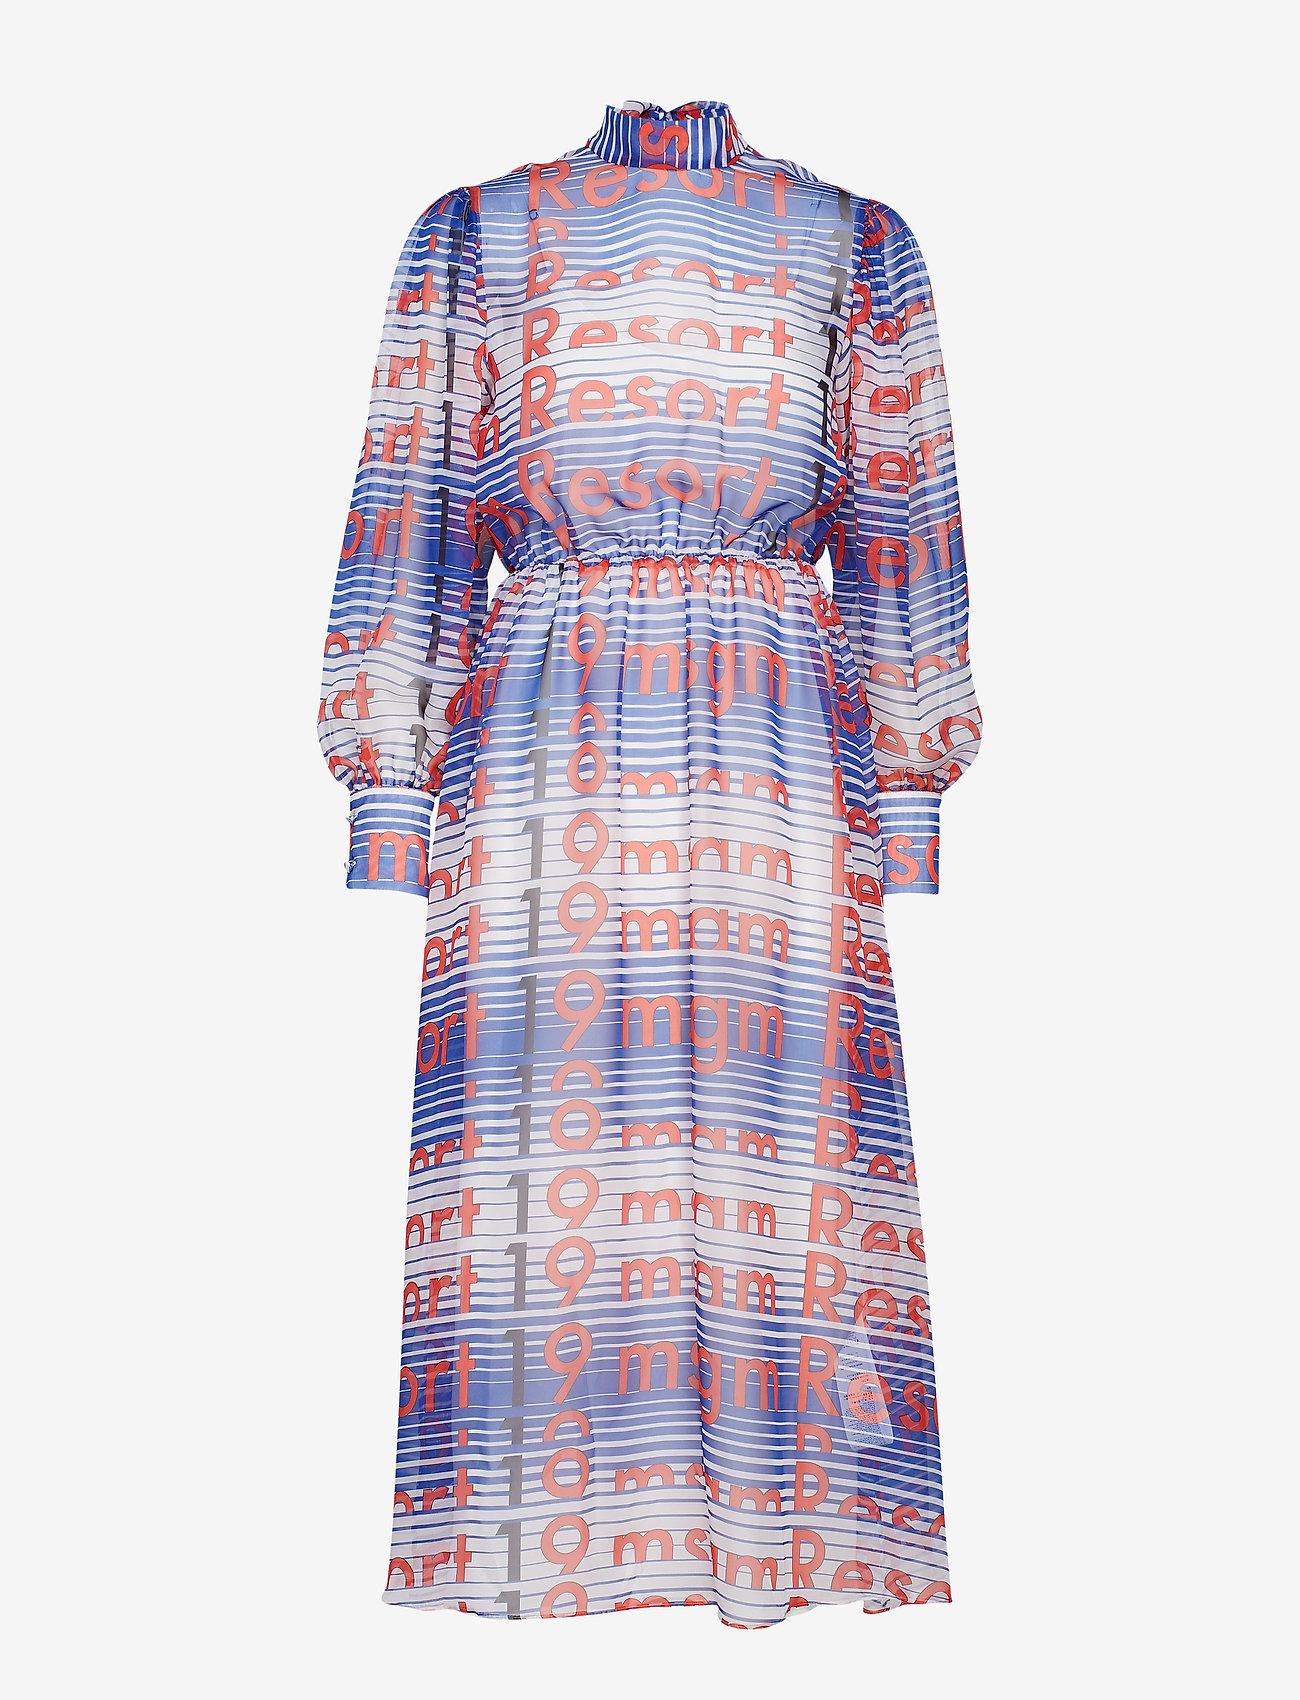 MSGM - DRESS - midi dresses - blue